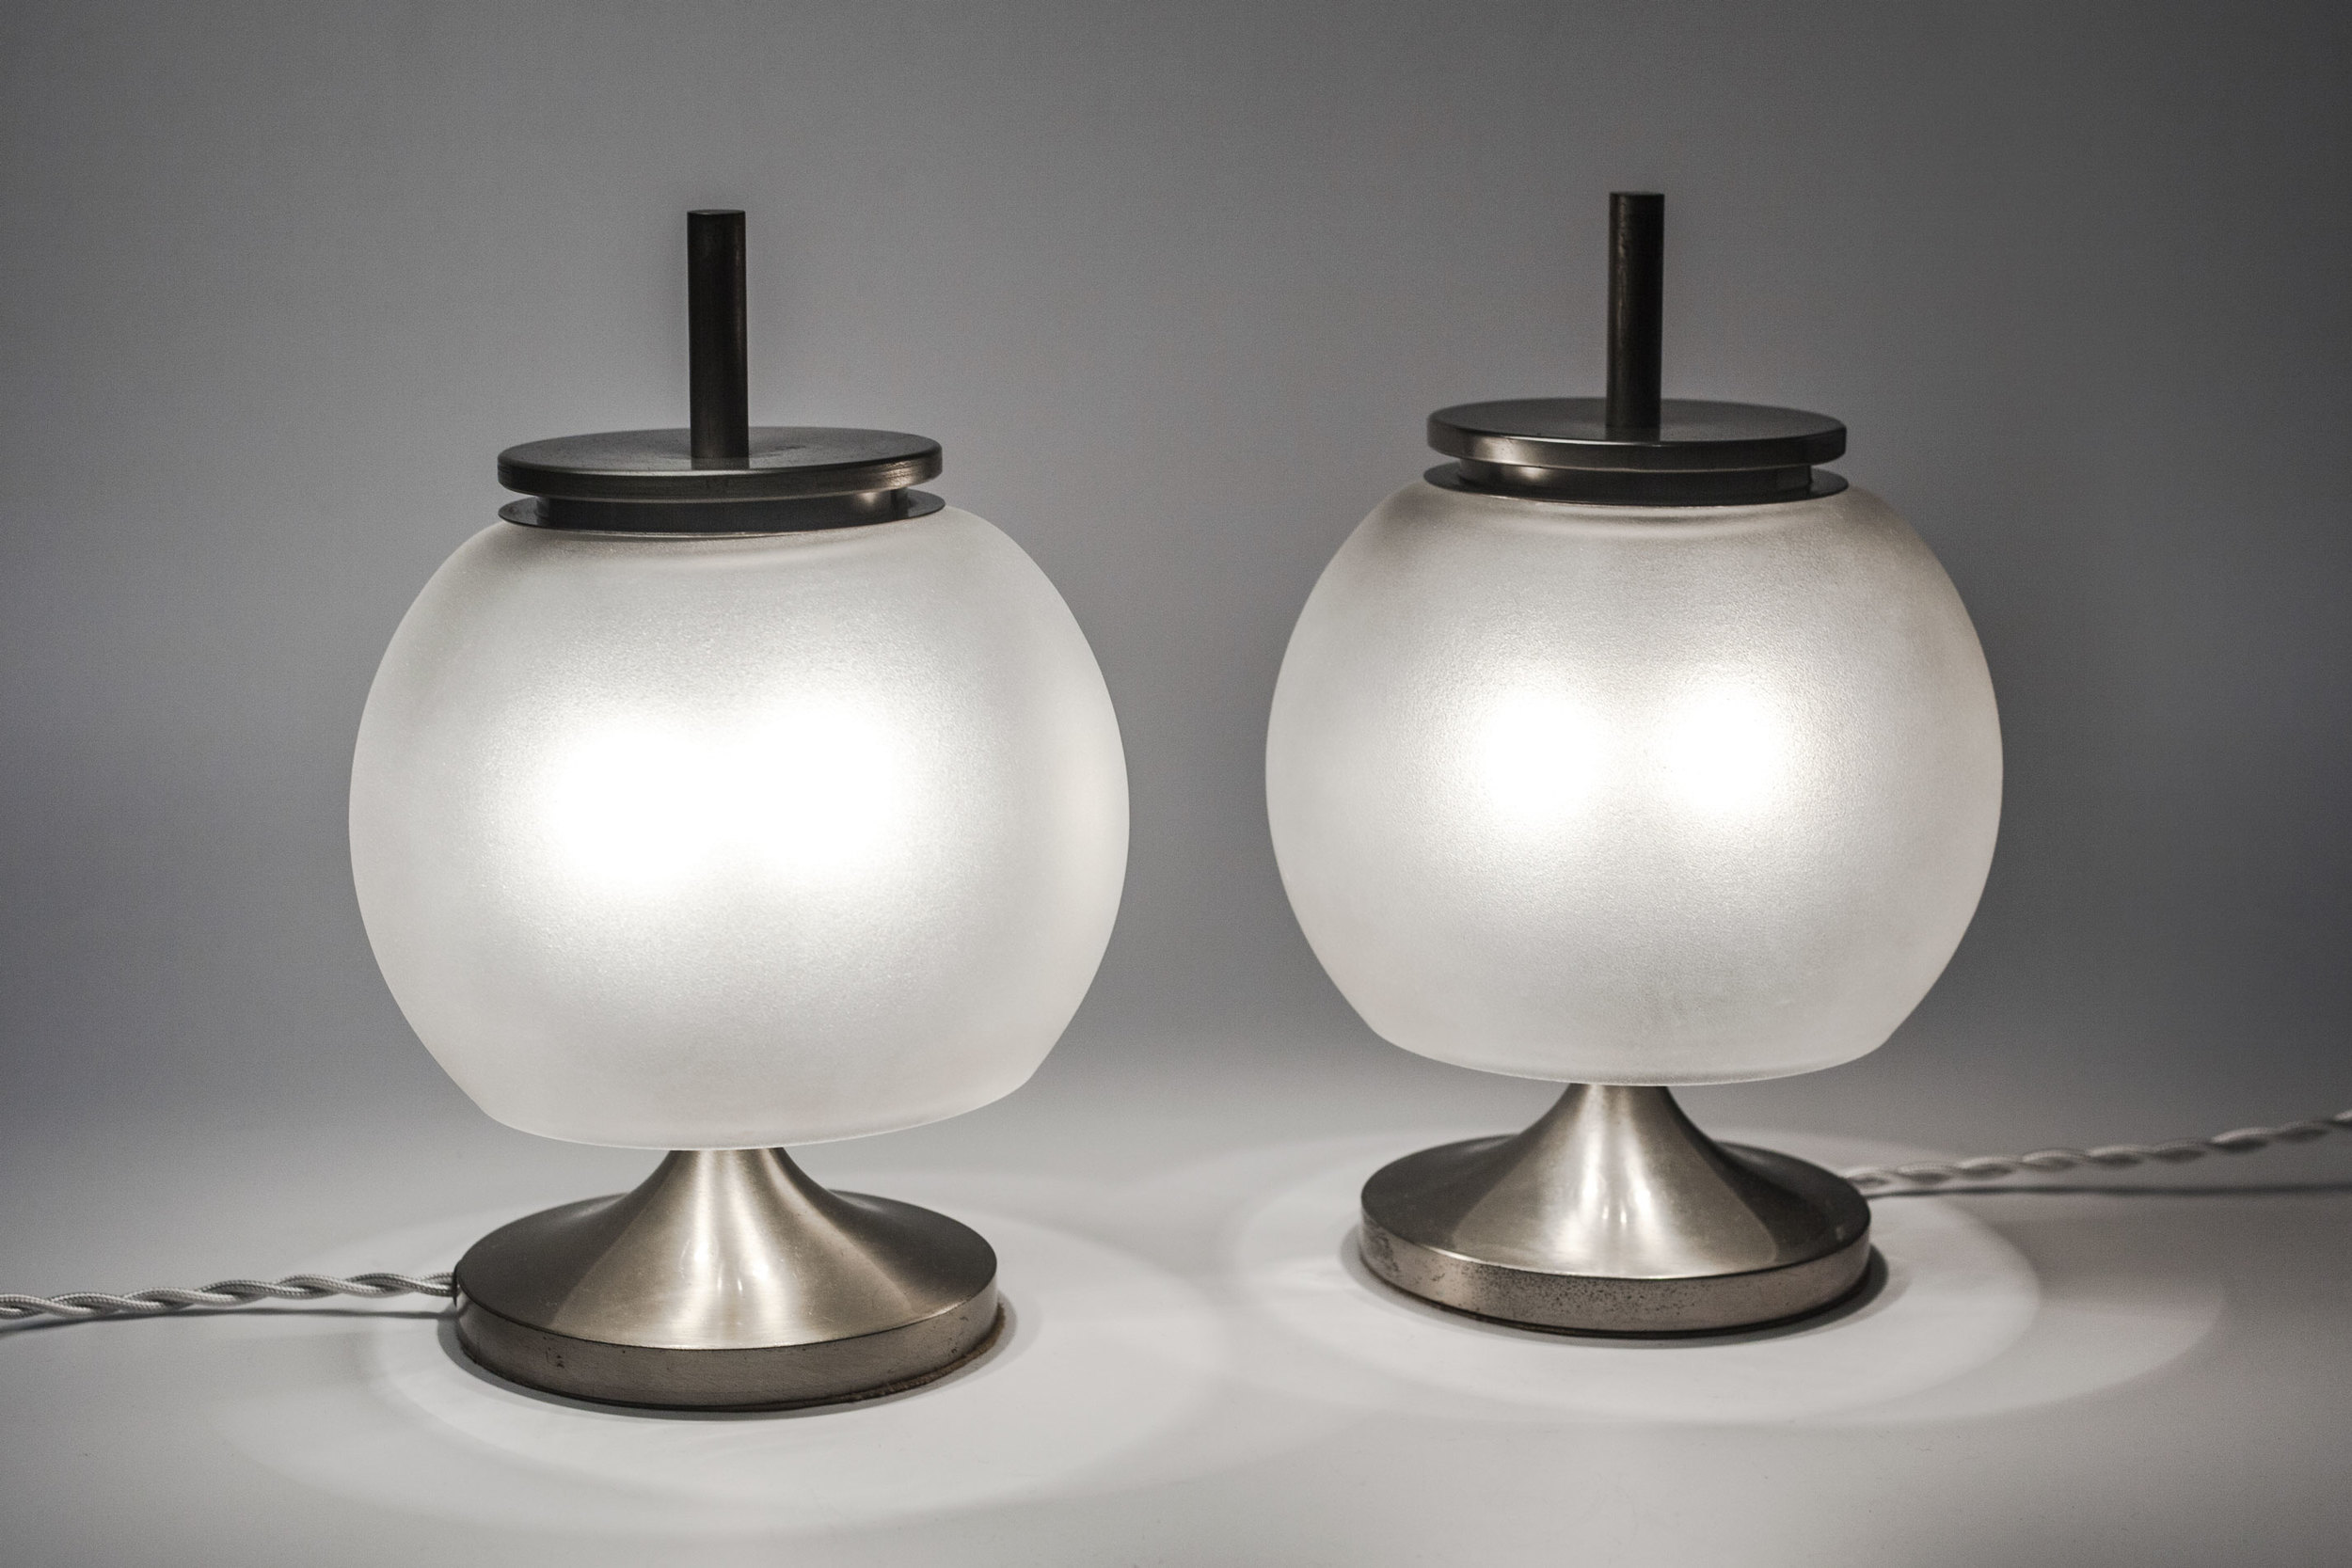 Pair of Italian Mid Century Lamps Bedside